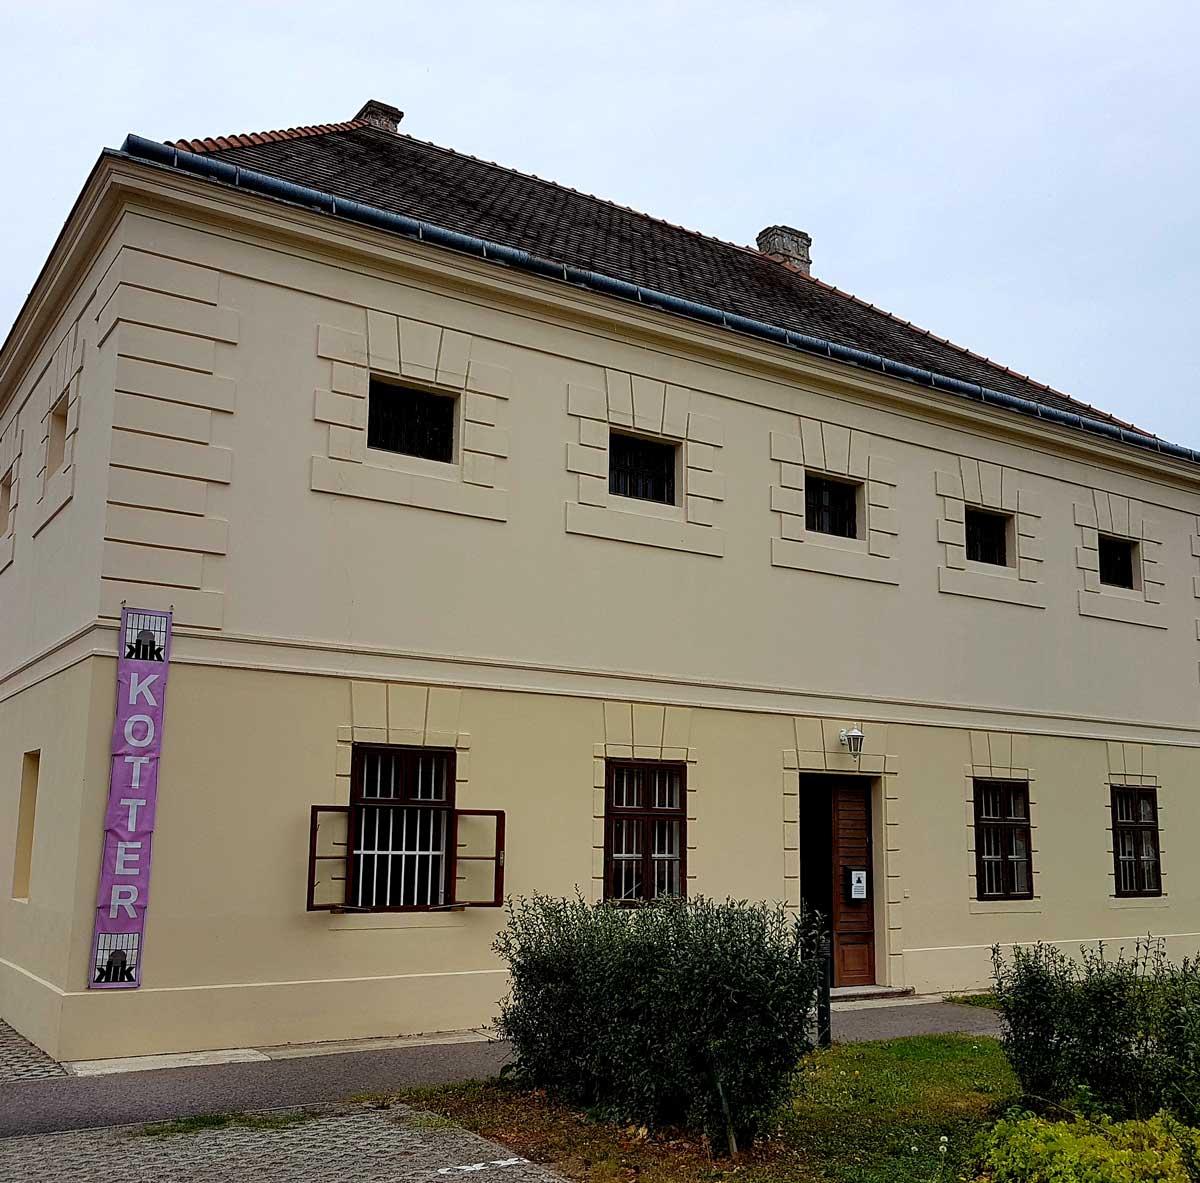 Kotter Groß-Enzersdorf